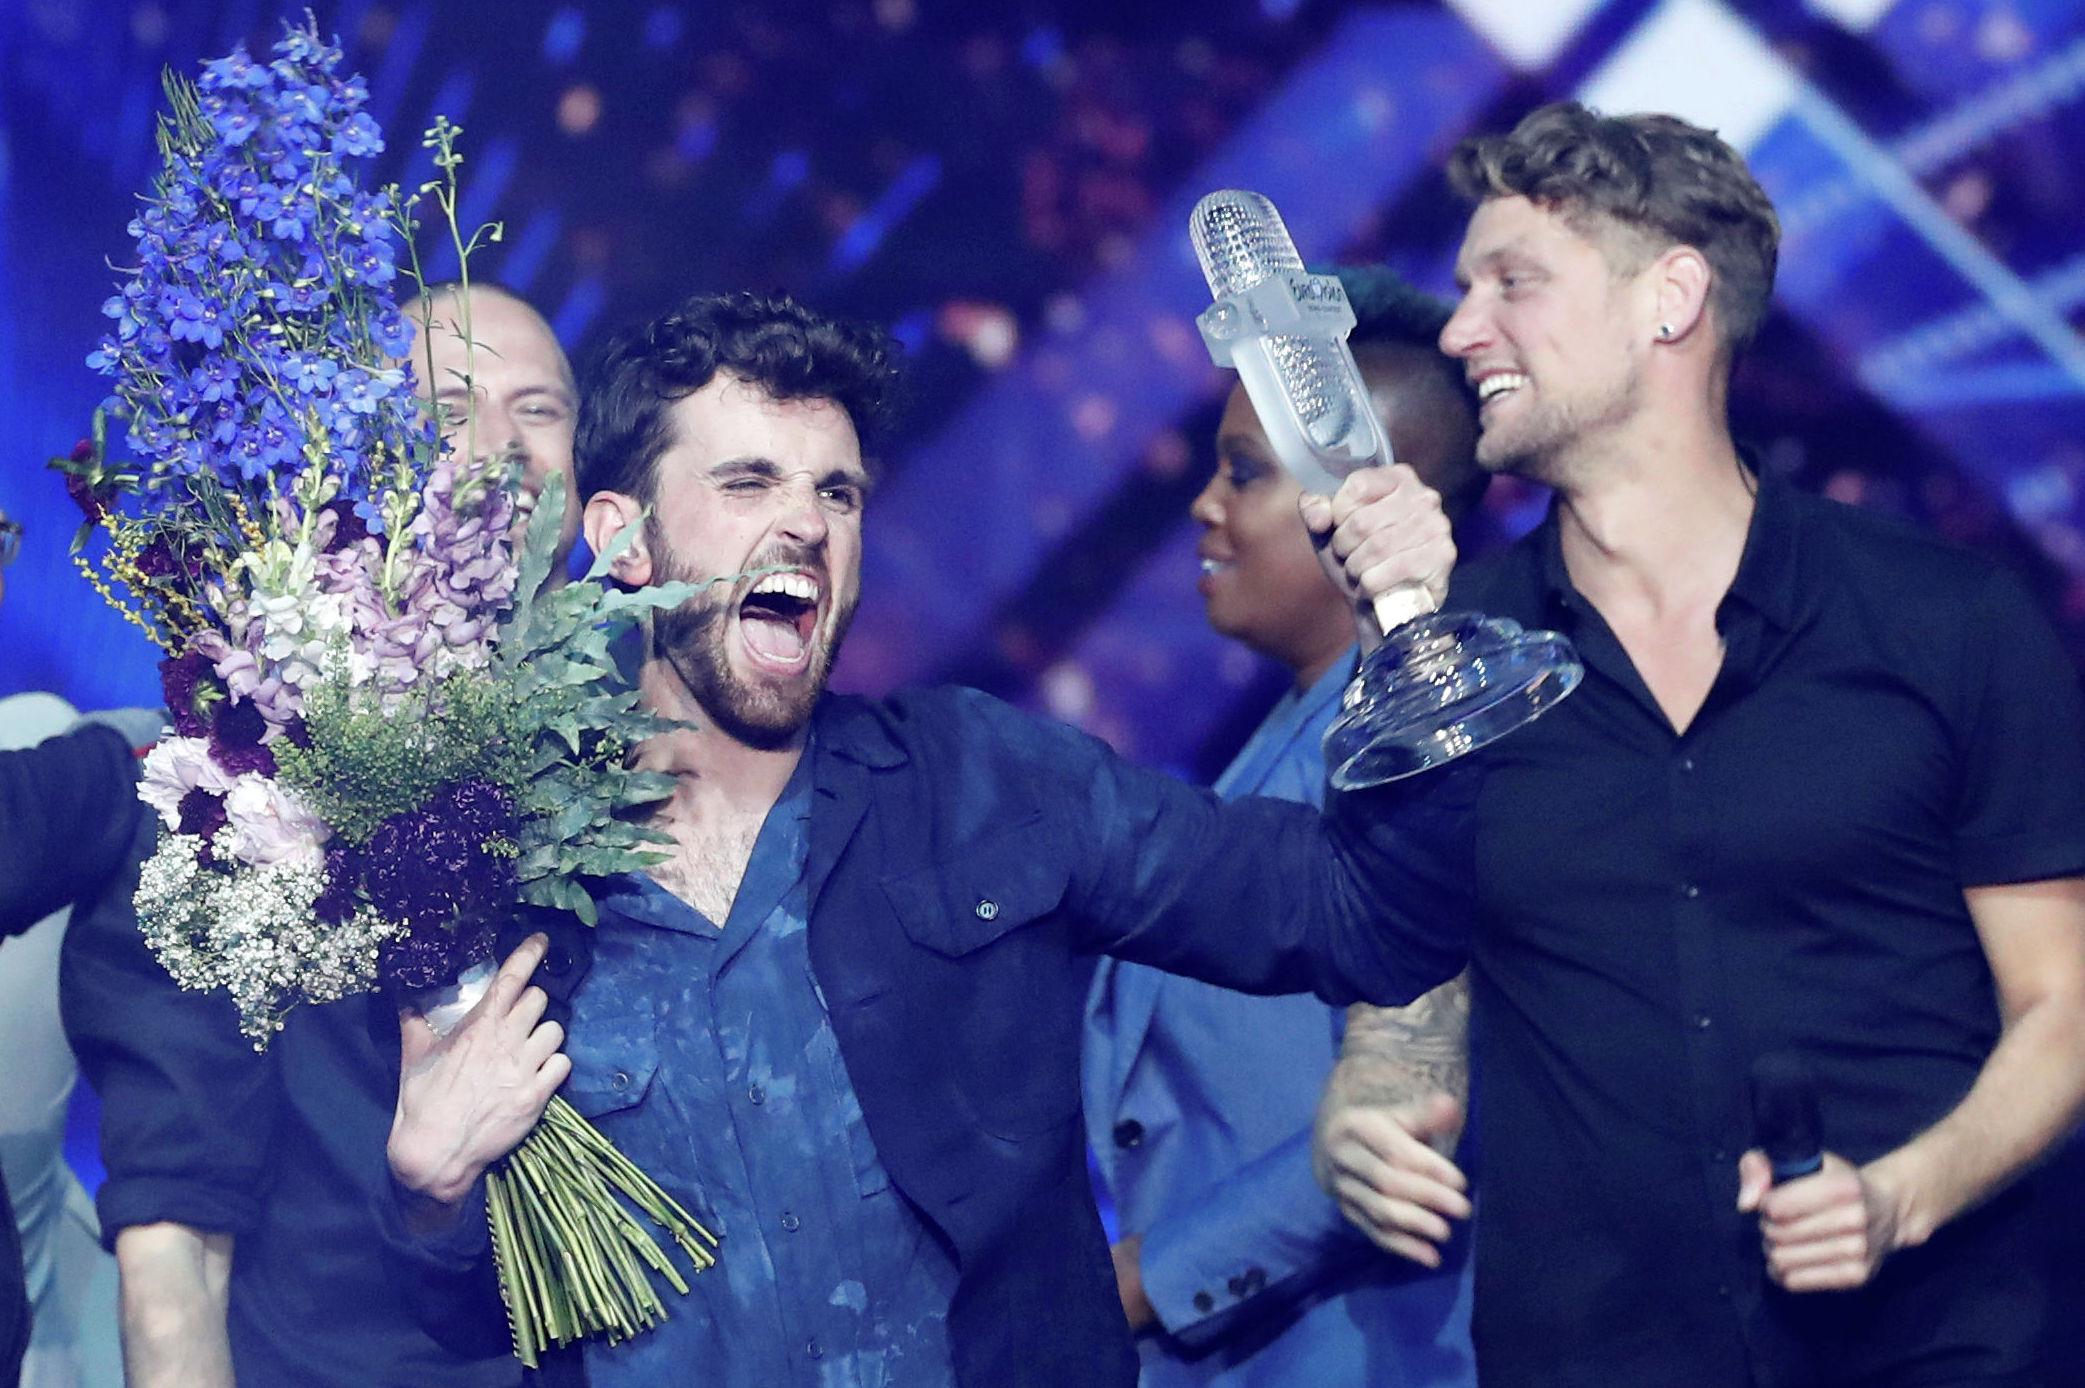 Солист из Нидерландов Дункан Лоуренс, победивший на конкурсе Евровидение 2019